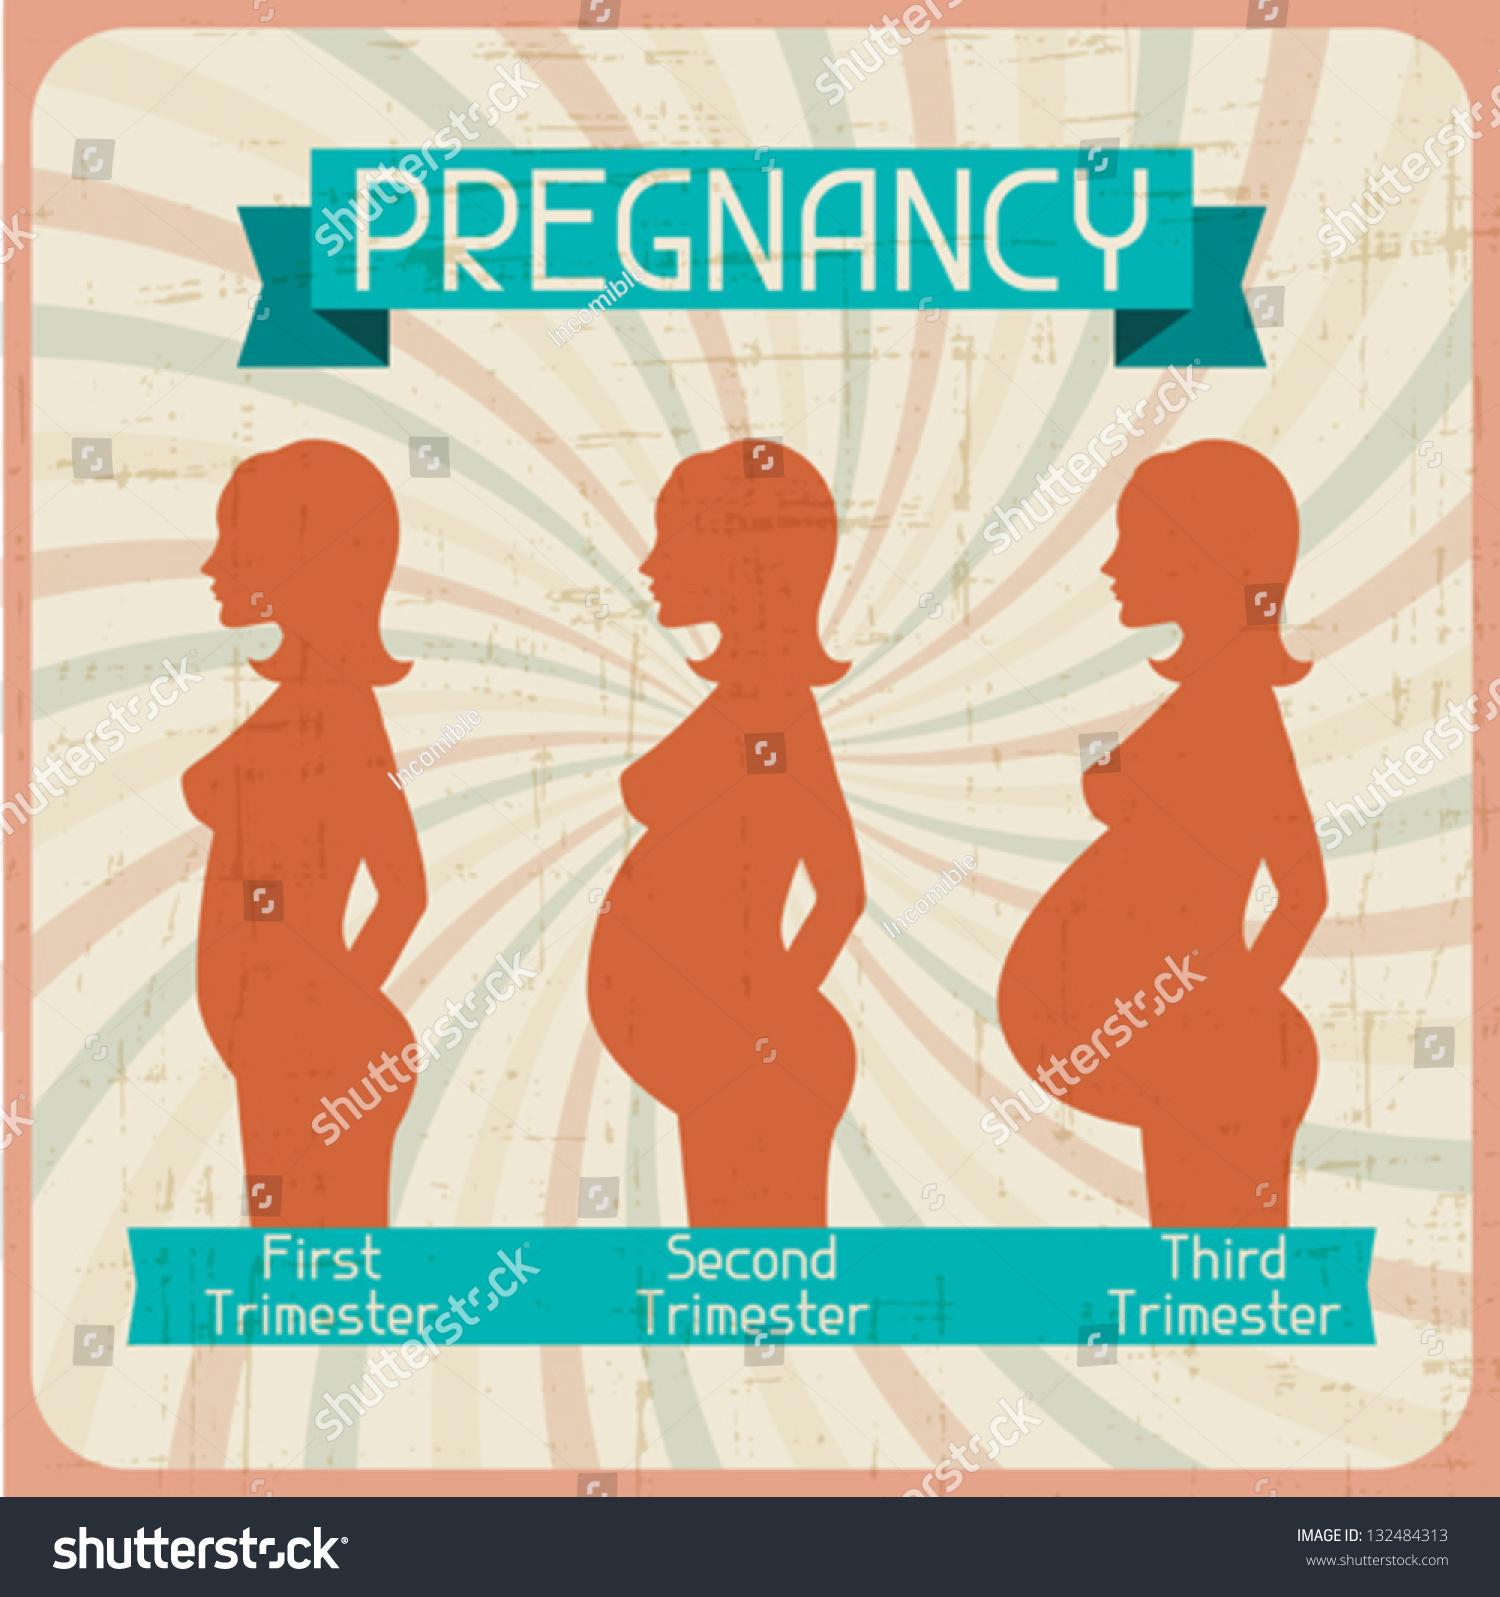 Silhouette Pregnant Woman Three Trimesters Stock Vector 132484313 ...